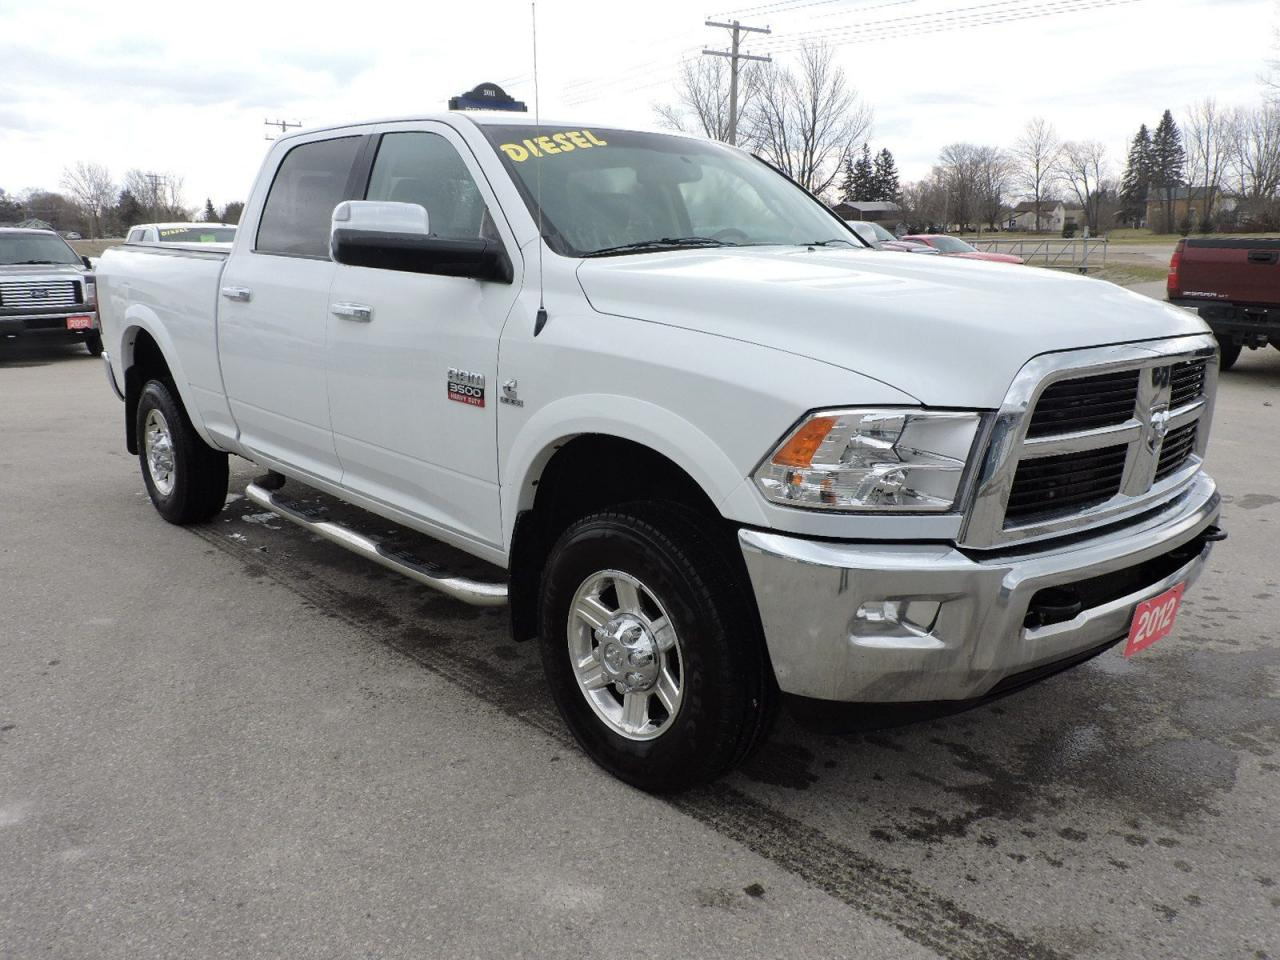 2012 RAM 3500 Laramie. Diesel. Leather. New tires